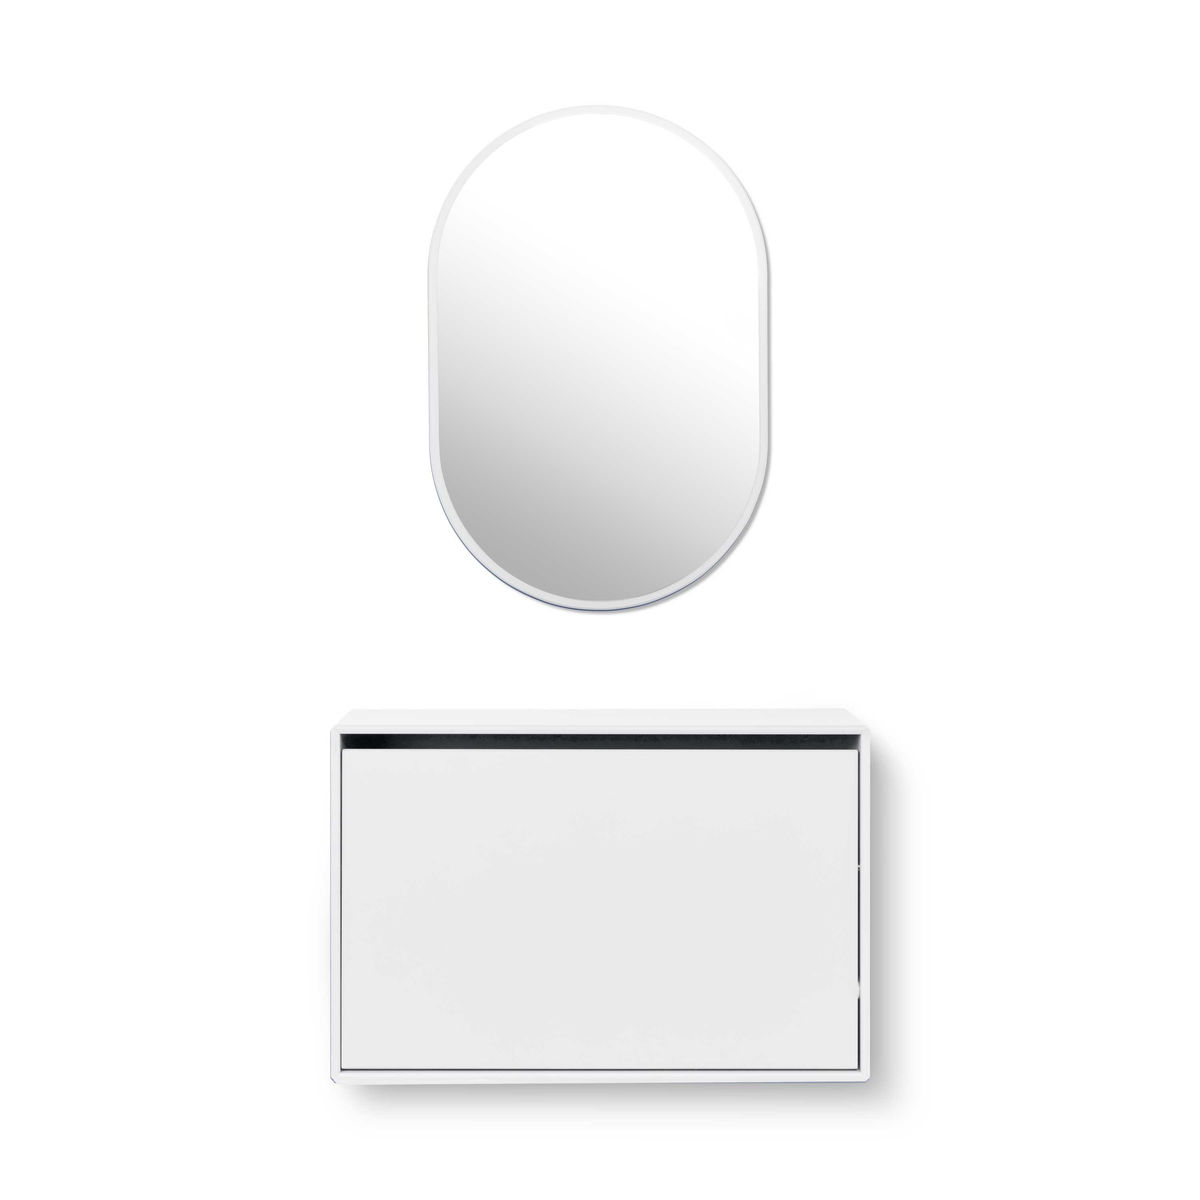 Hello armoire f chaussures avec miroir montana - Armoire a chaussures avec miroir ...